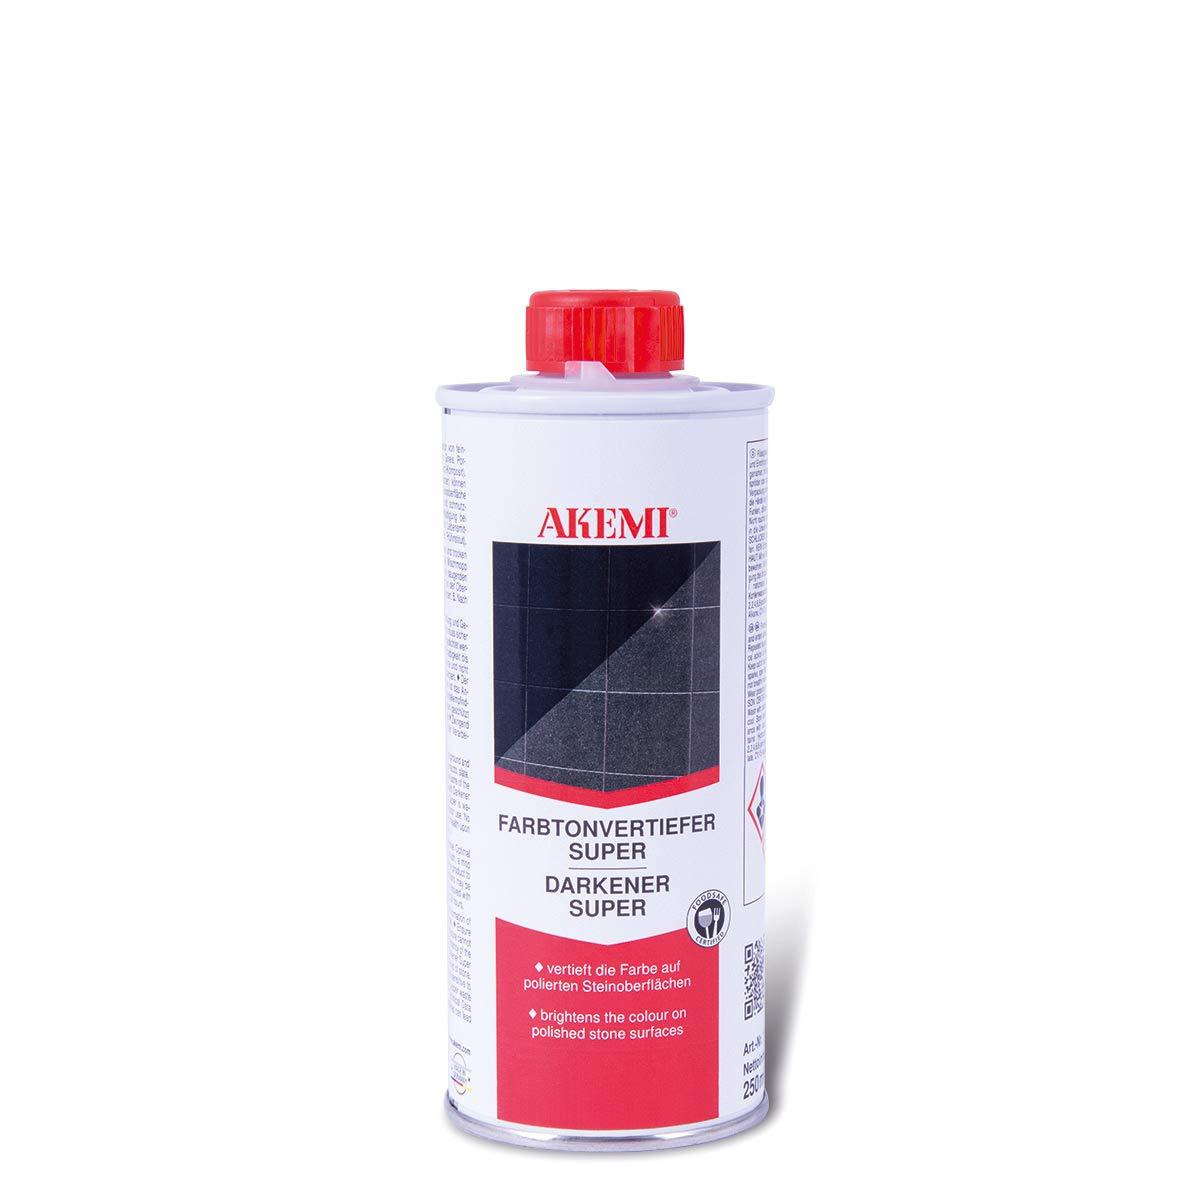 Akemi Darkener Super - 250 ml